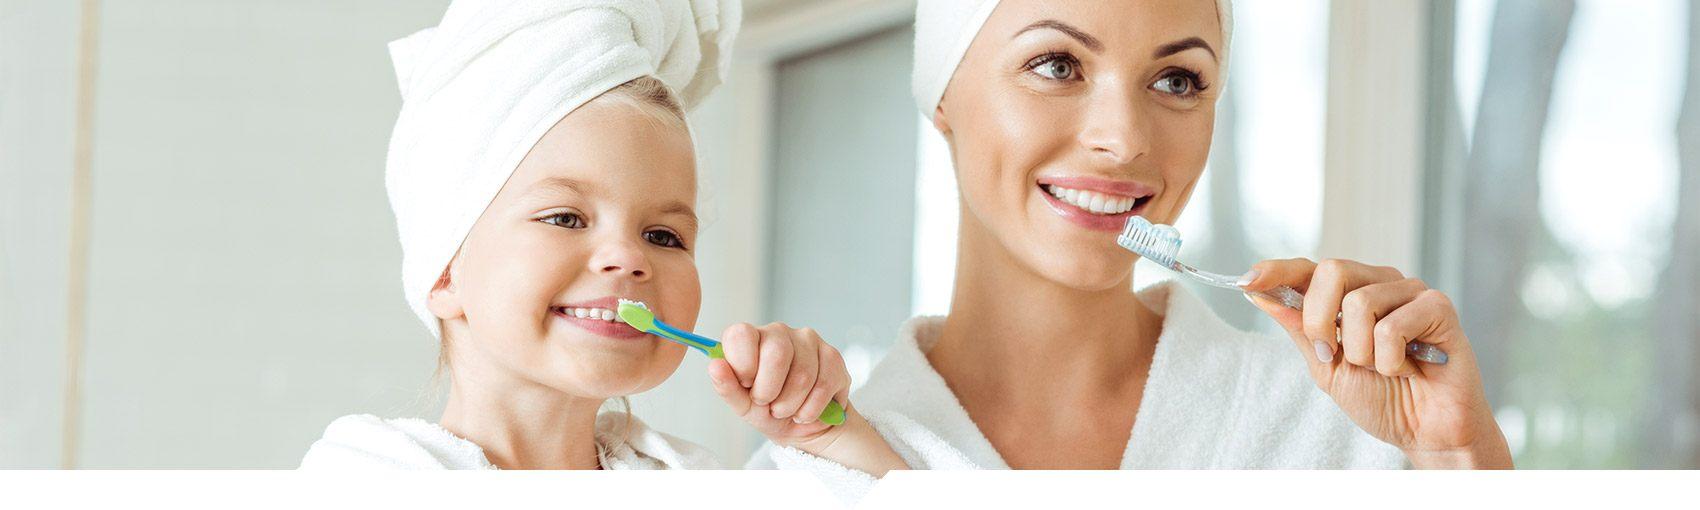 Oral Hygiene, CA